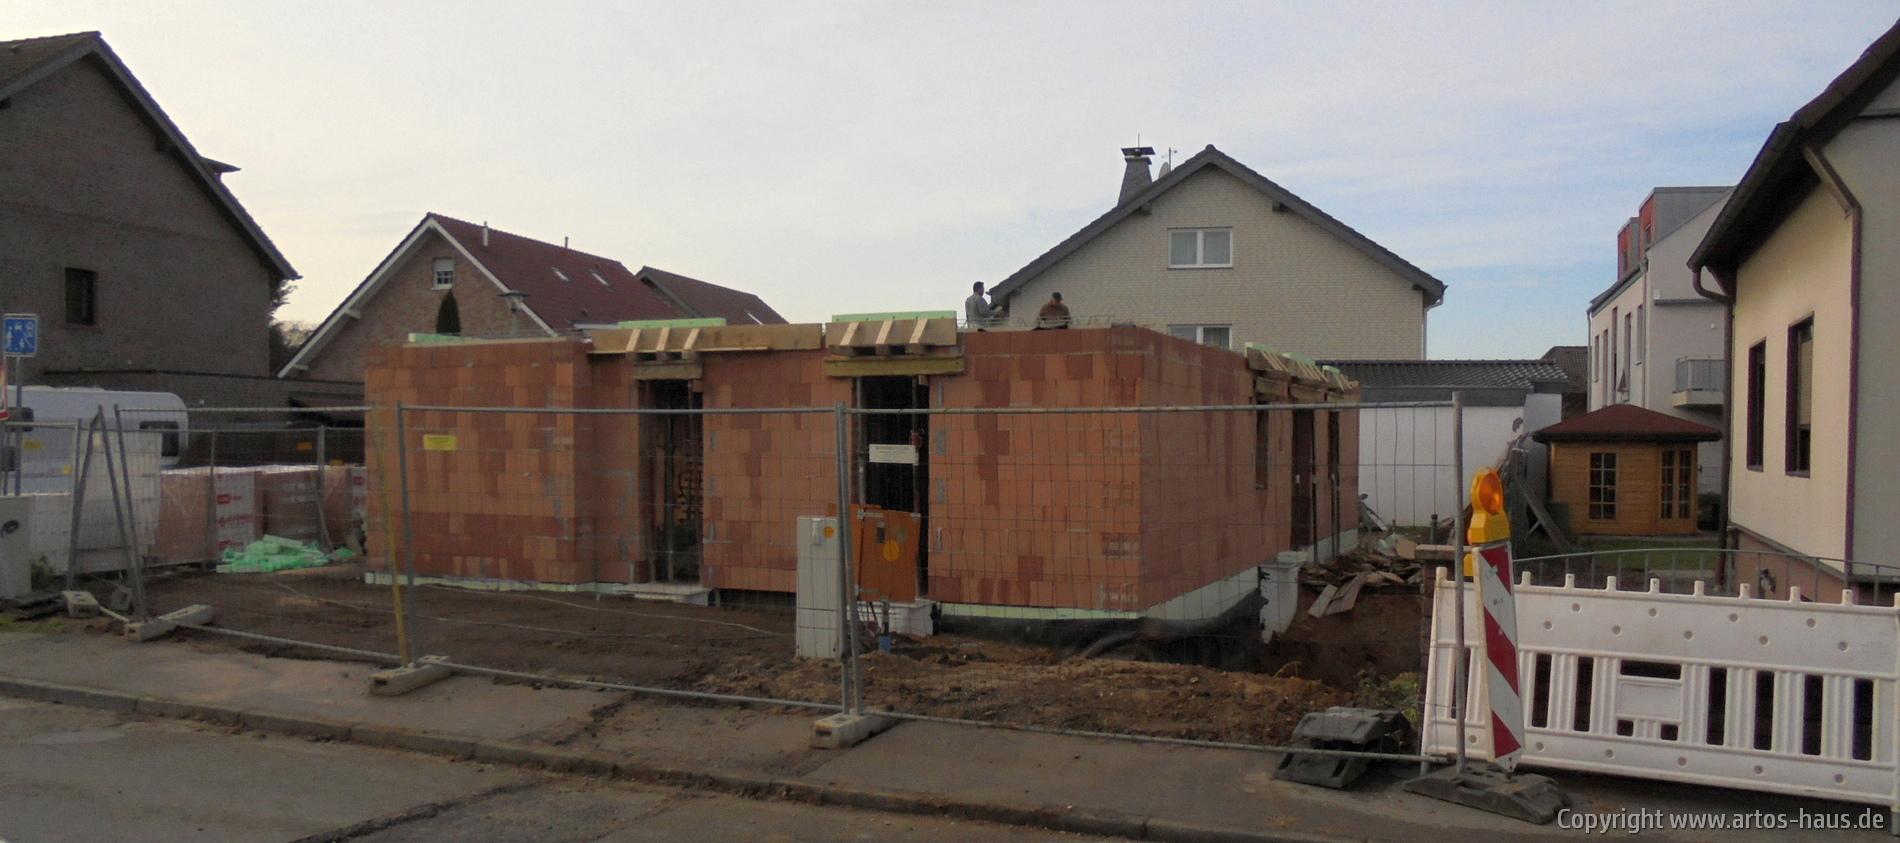 Rohbau BV ARTOS HAUS | Bild 1